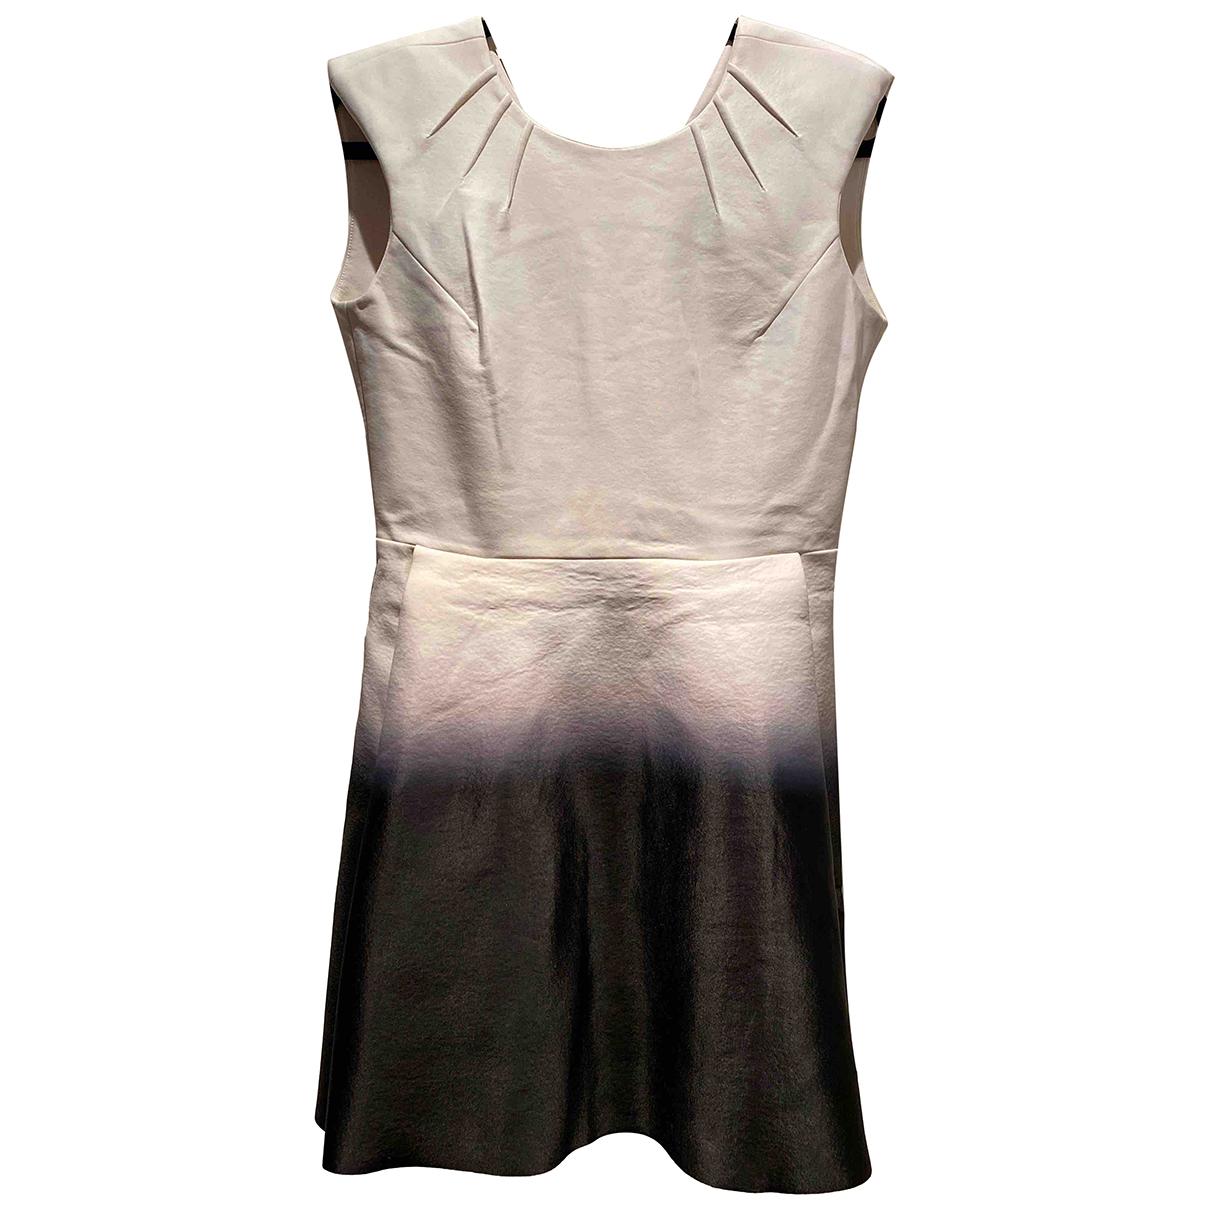 Maje N Multicolour Cotton - elasthane dress for Women 3 0-5